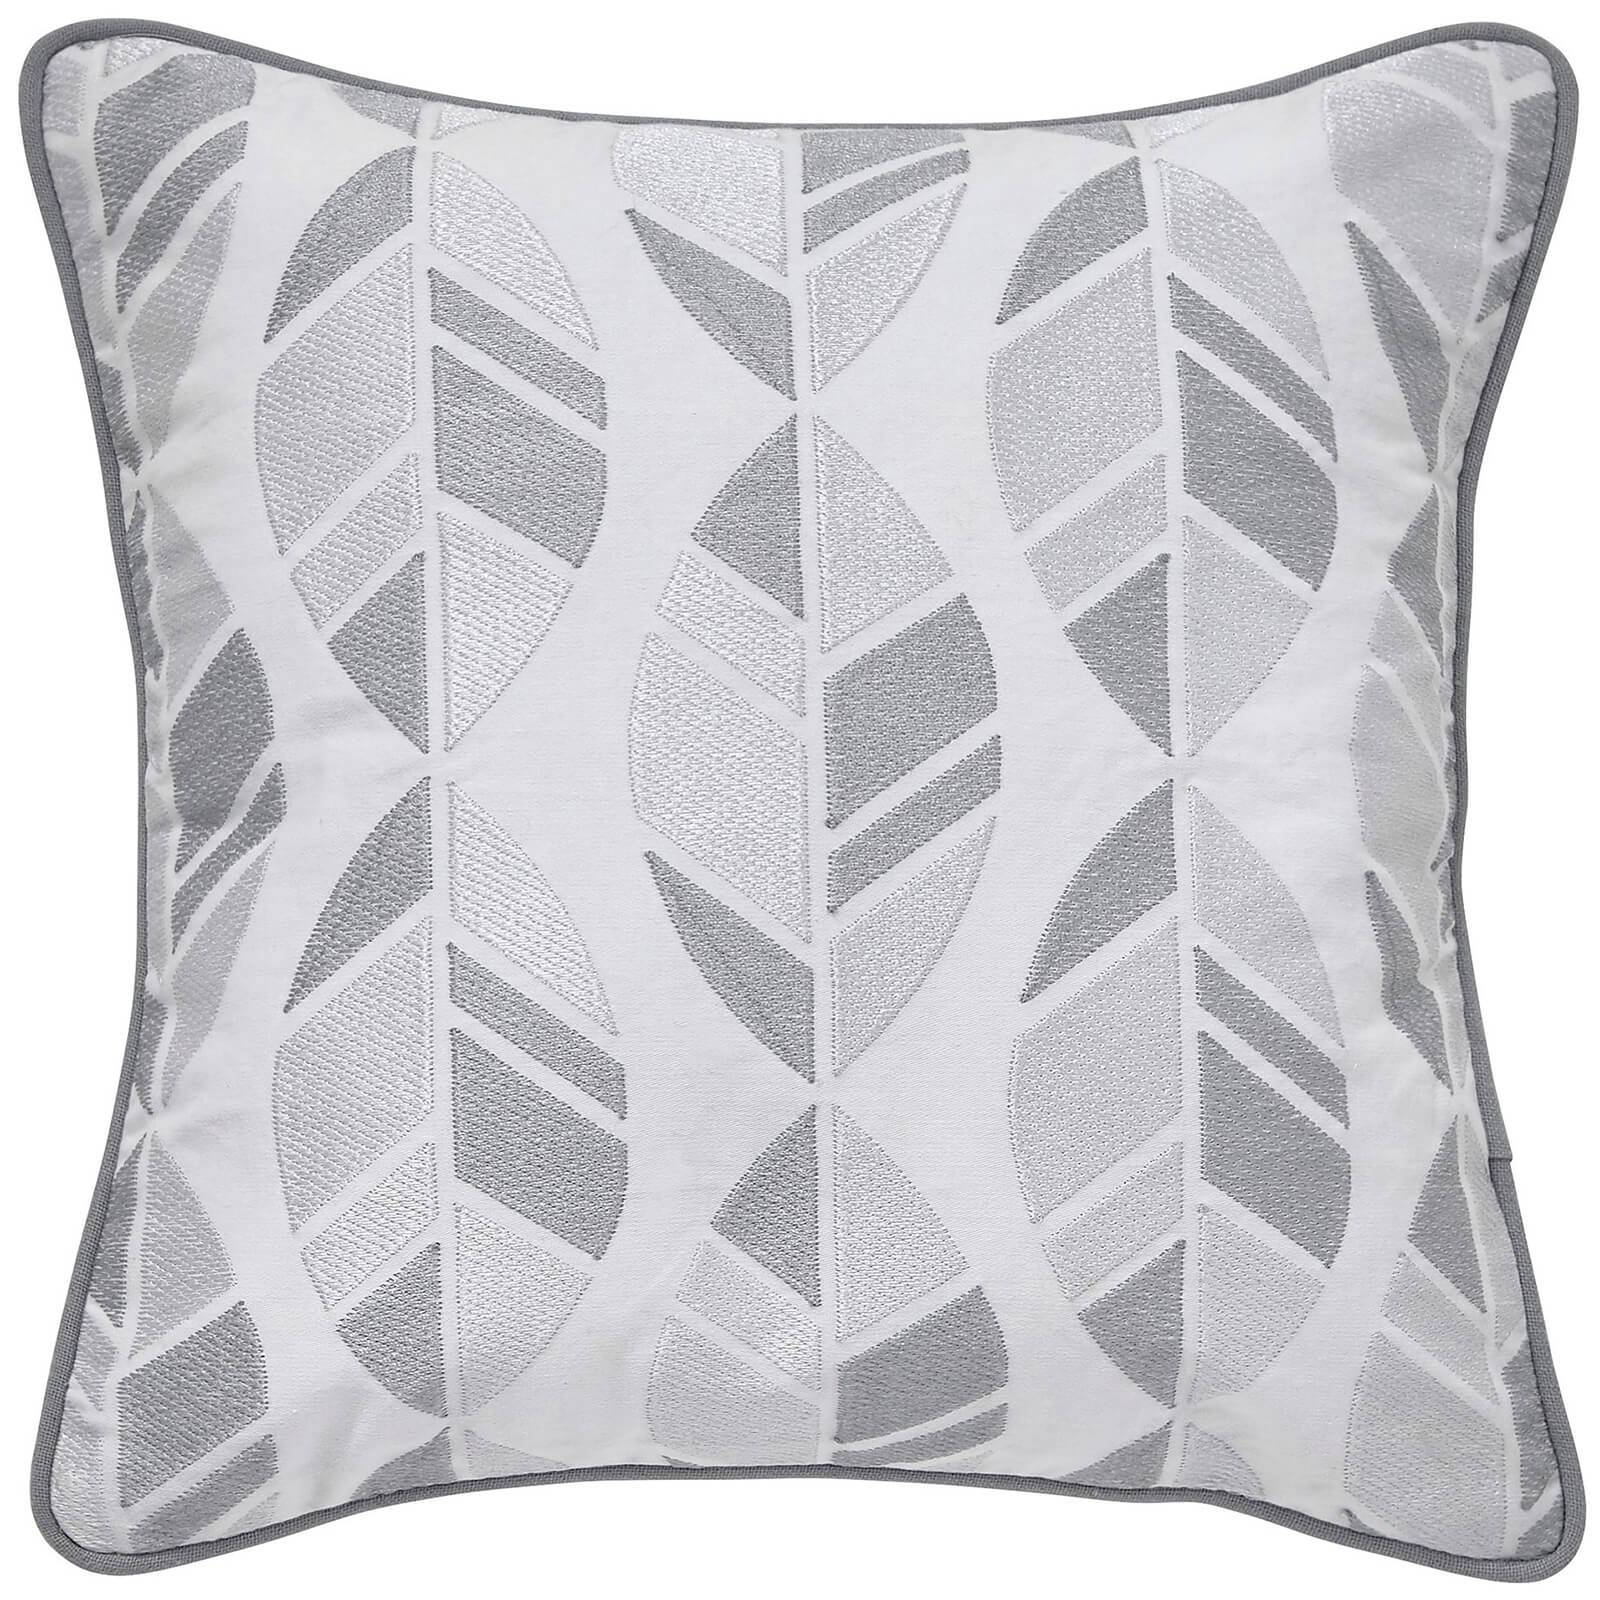 Helena Springfield Petal Cushion - White